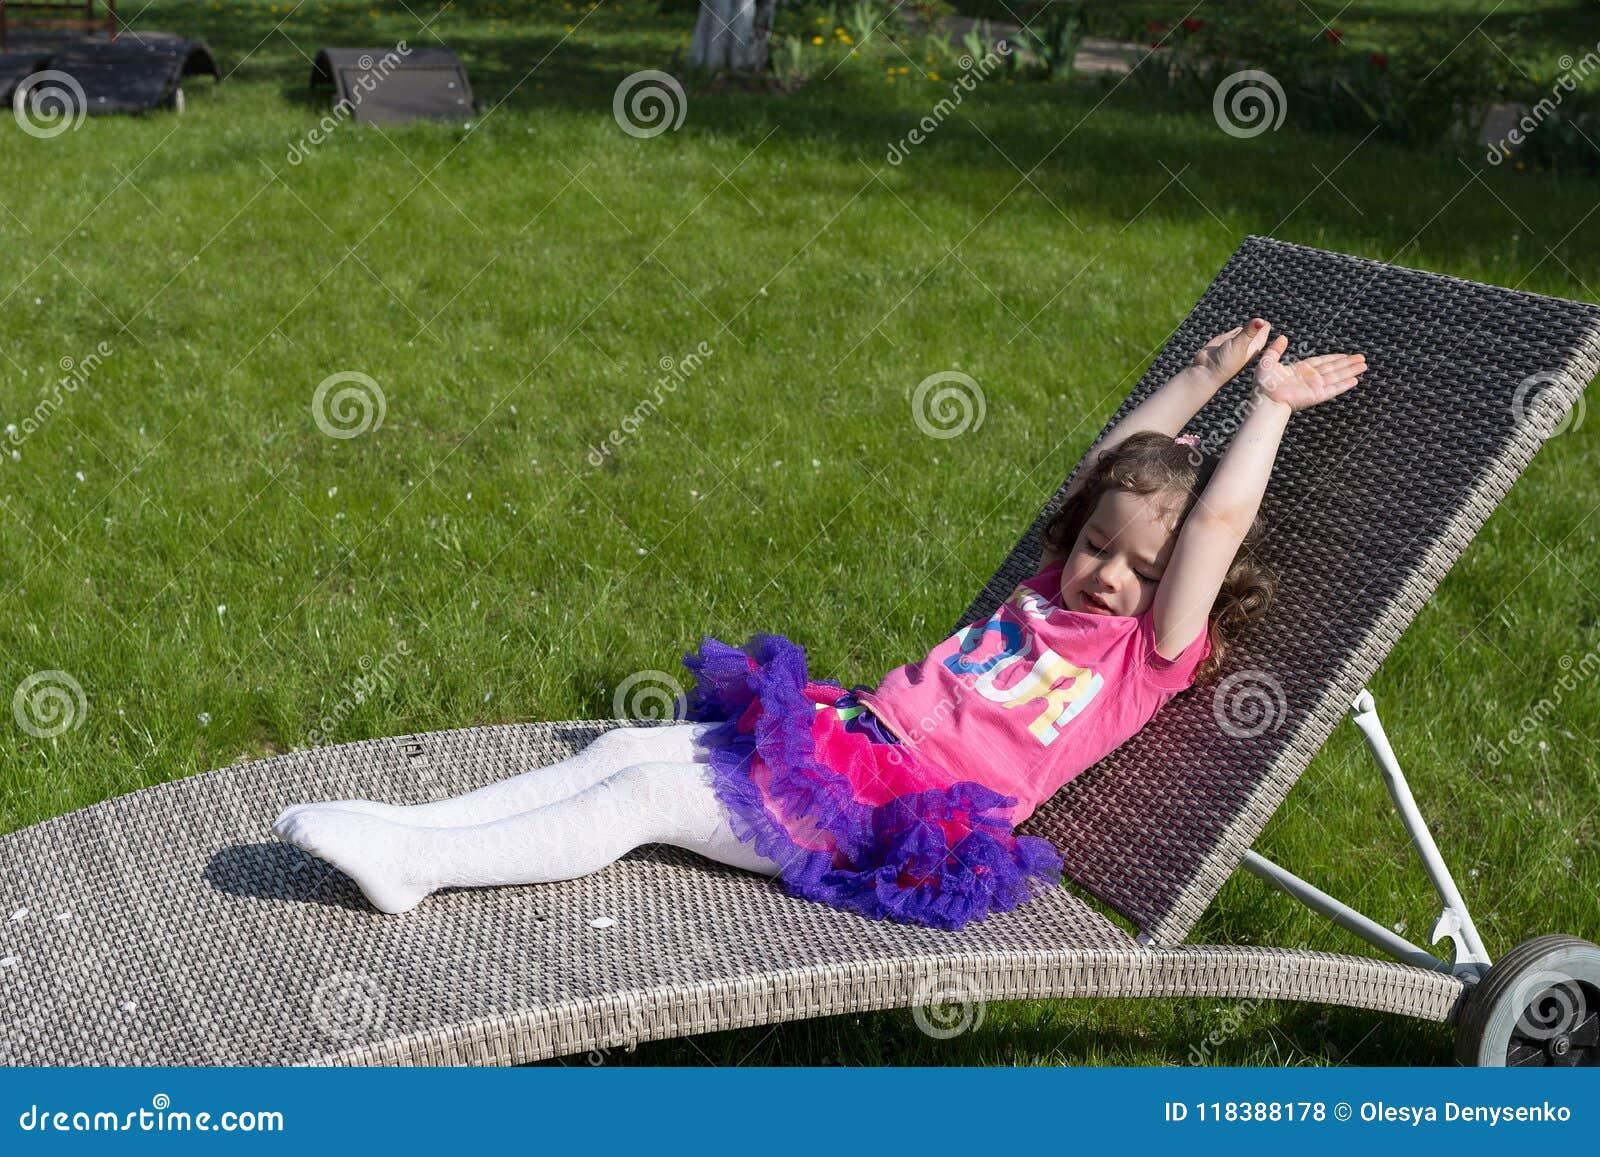 Little girl has a sunbath